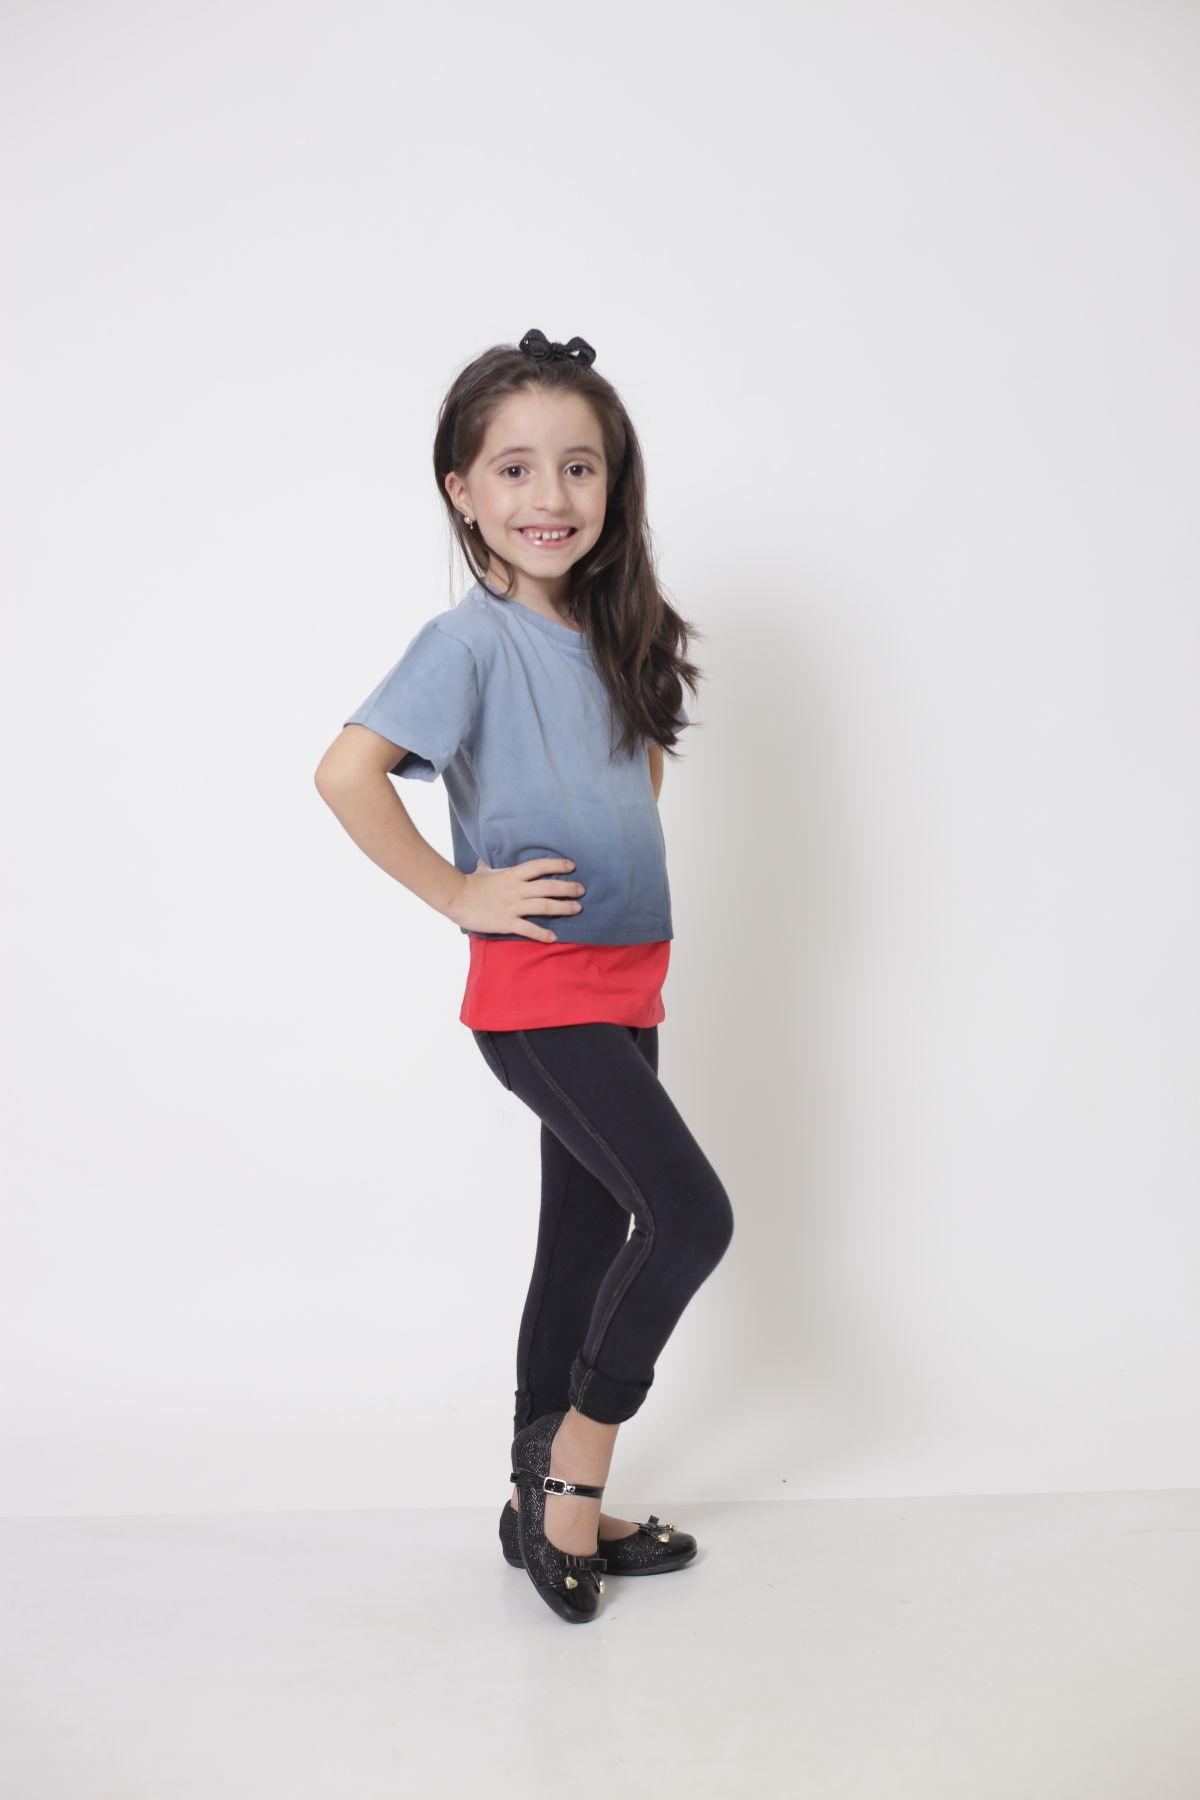 Camiseta ou Body Infantil Unissex - Degradê  - Heitor Fashion Brazil